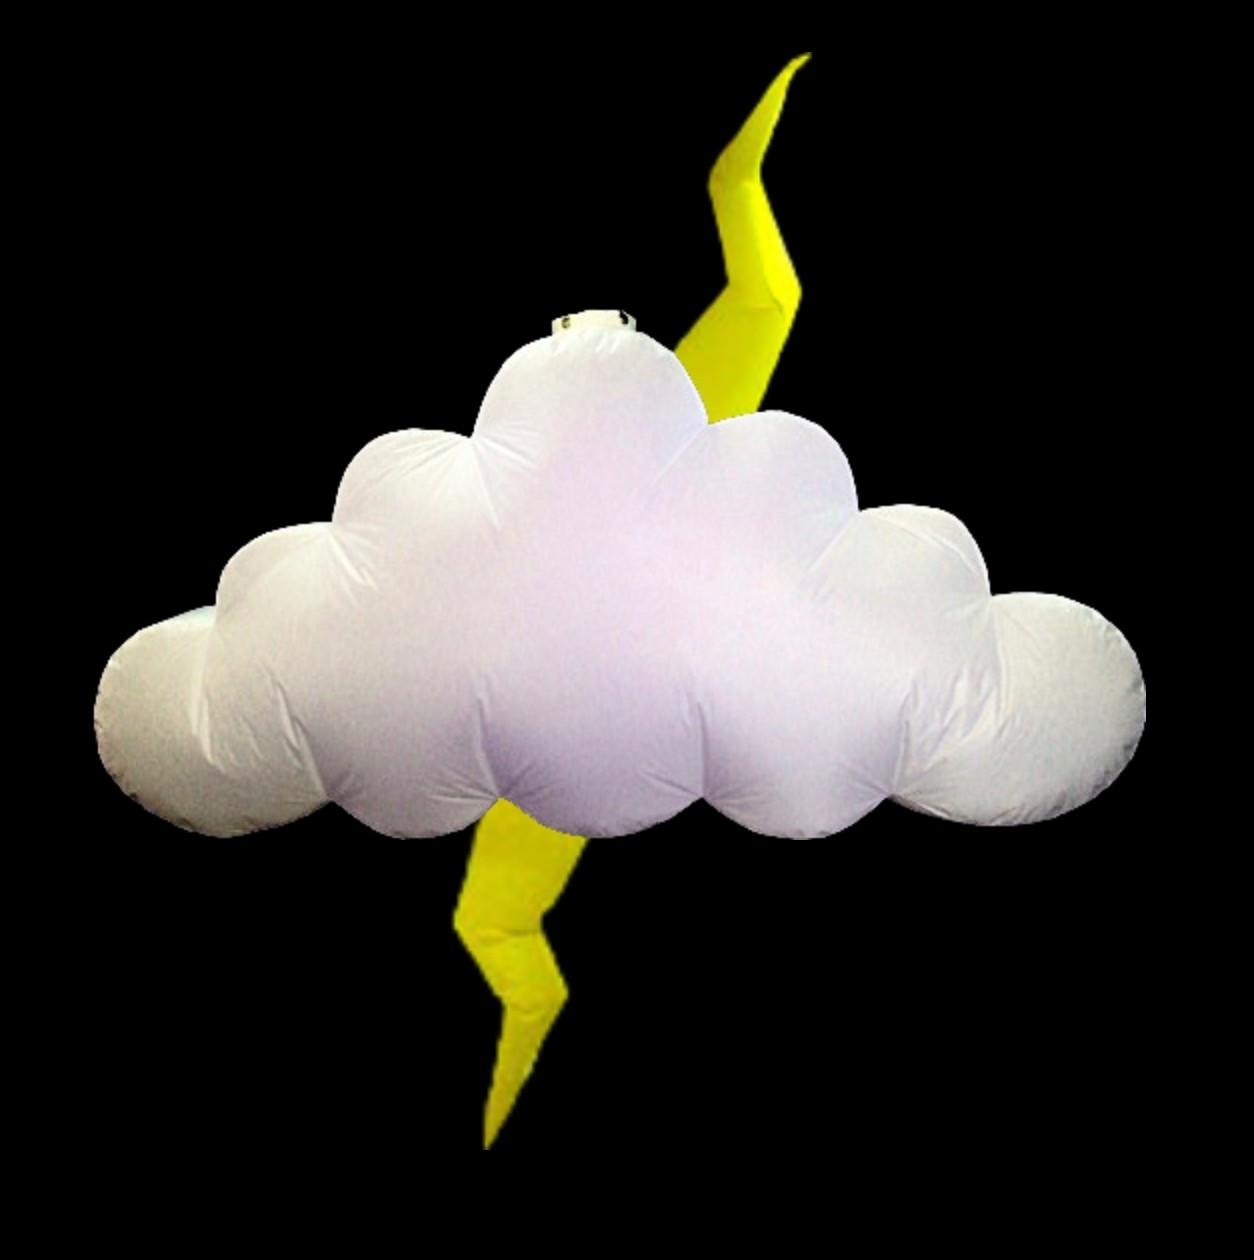 Hanging Inflatable Cloud 9.7ft/295cm x 5ft/152cm